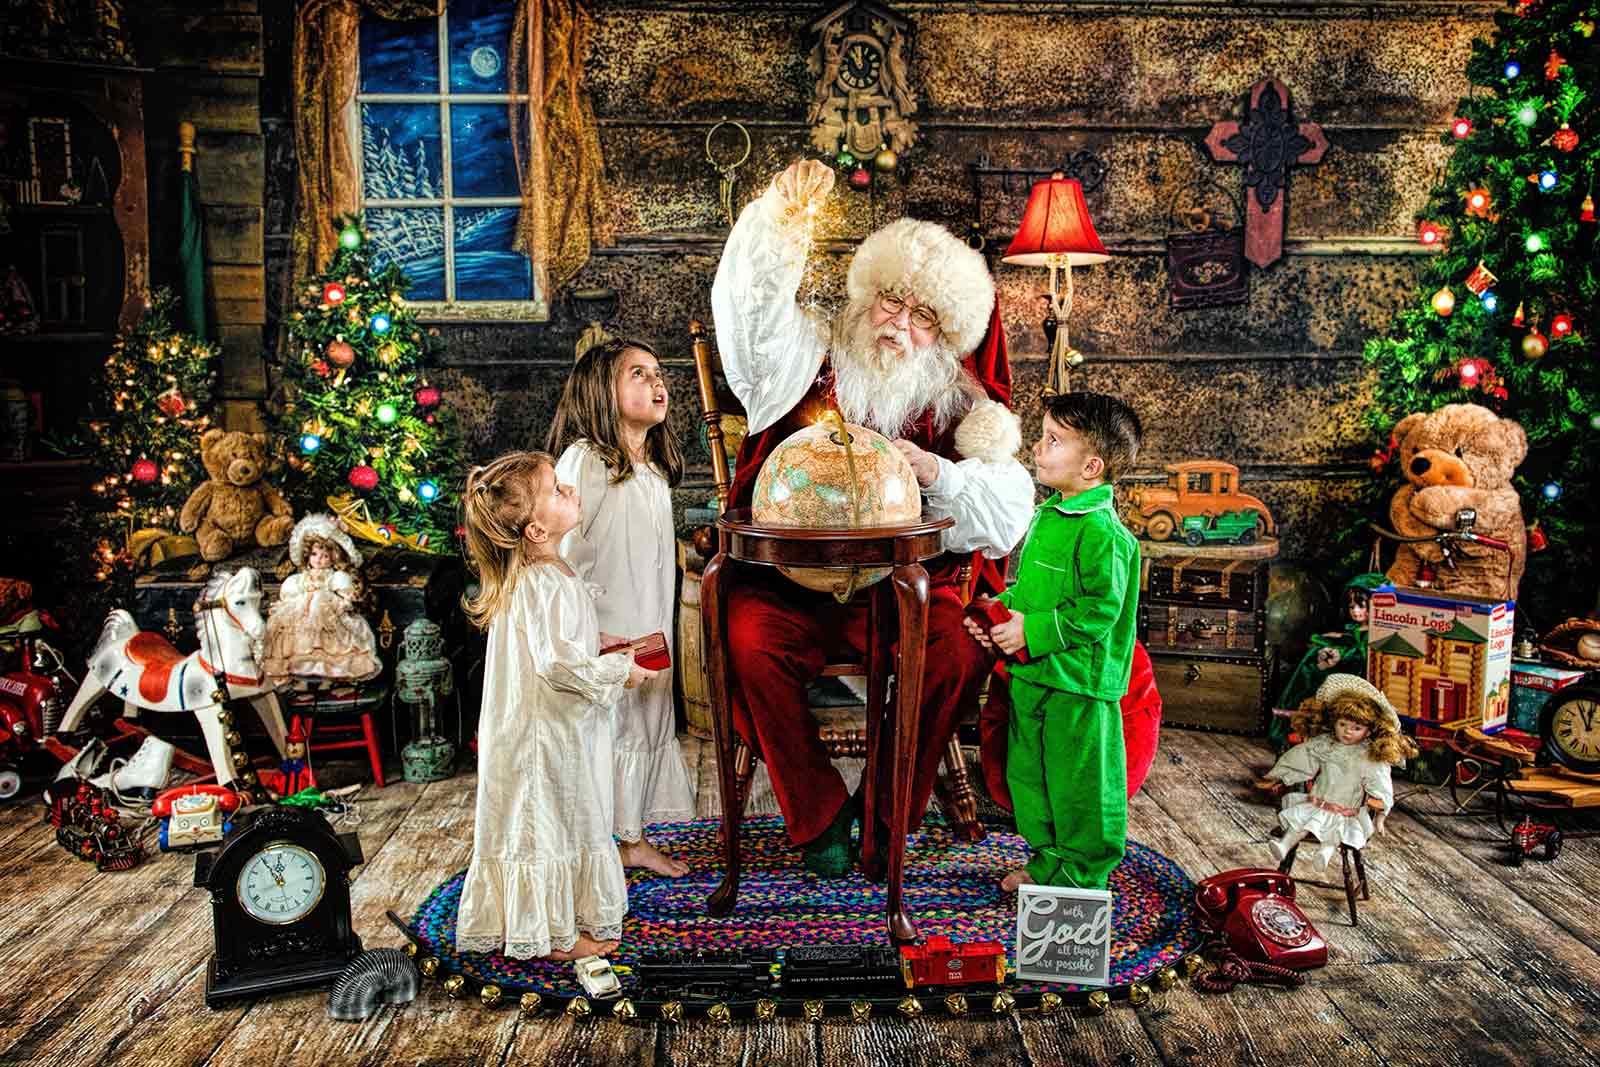 019_Magic-of-Santa-Anna-Thielen-Photography